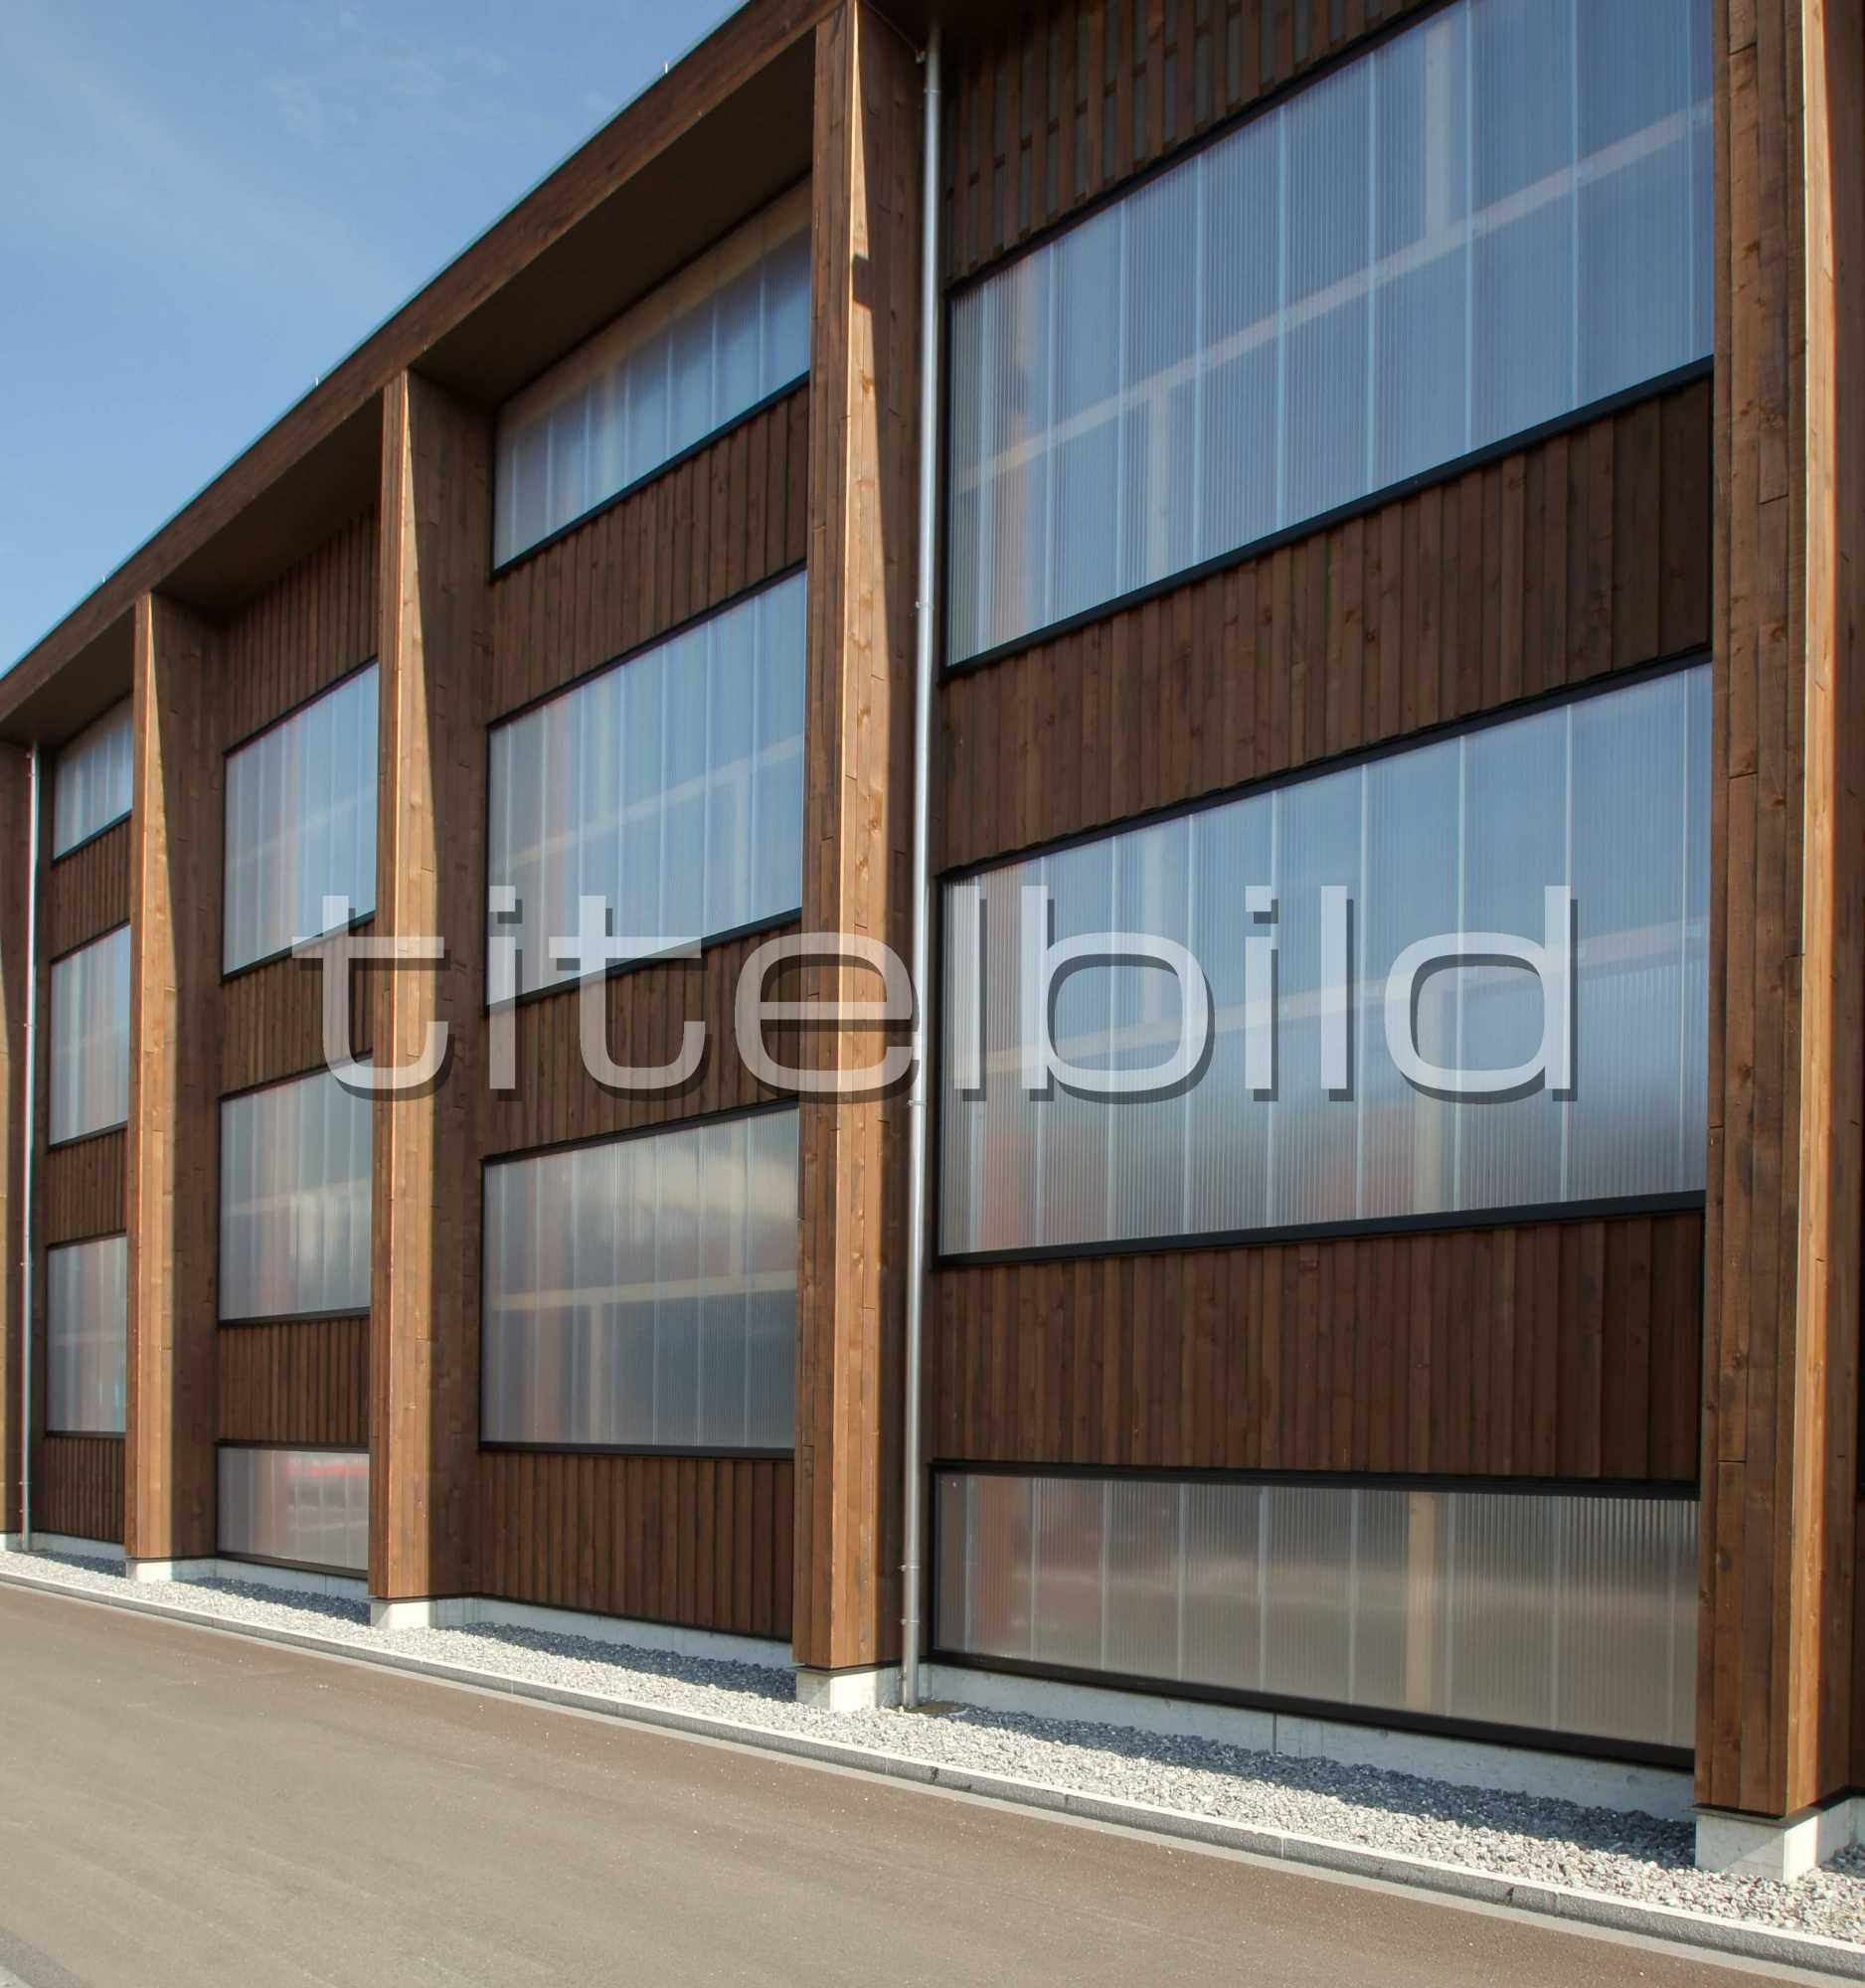 Projektbild-Nr. 5: Autobahn Werkhof Sprengi